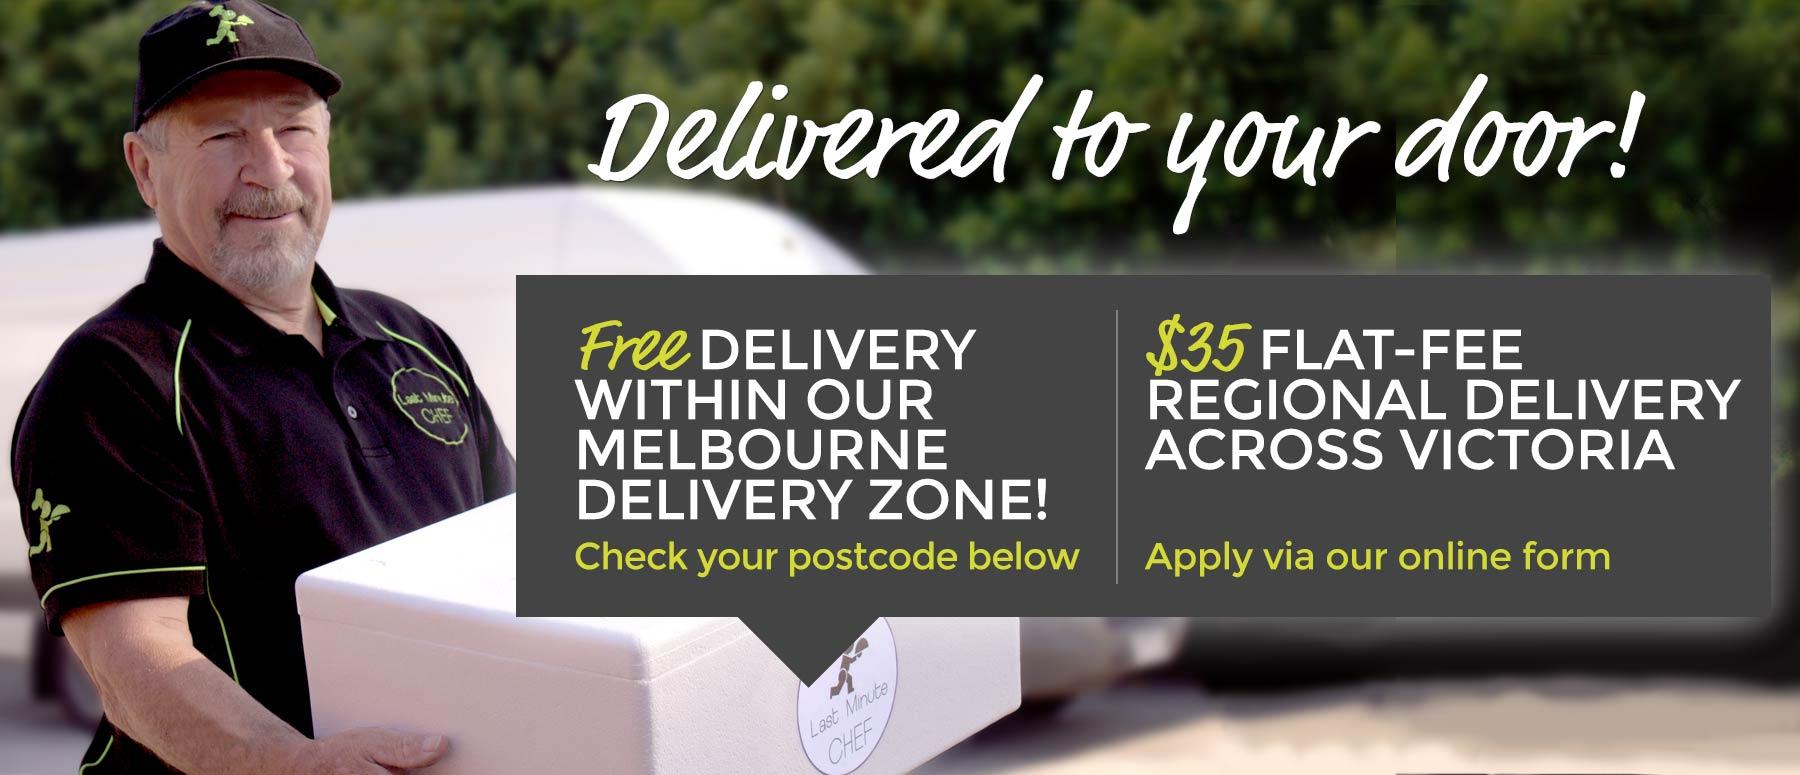 website-banner-delivery-options3